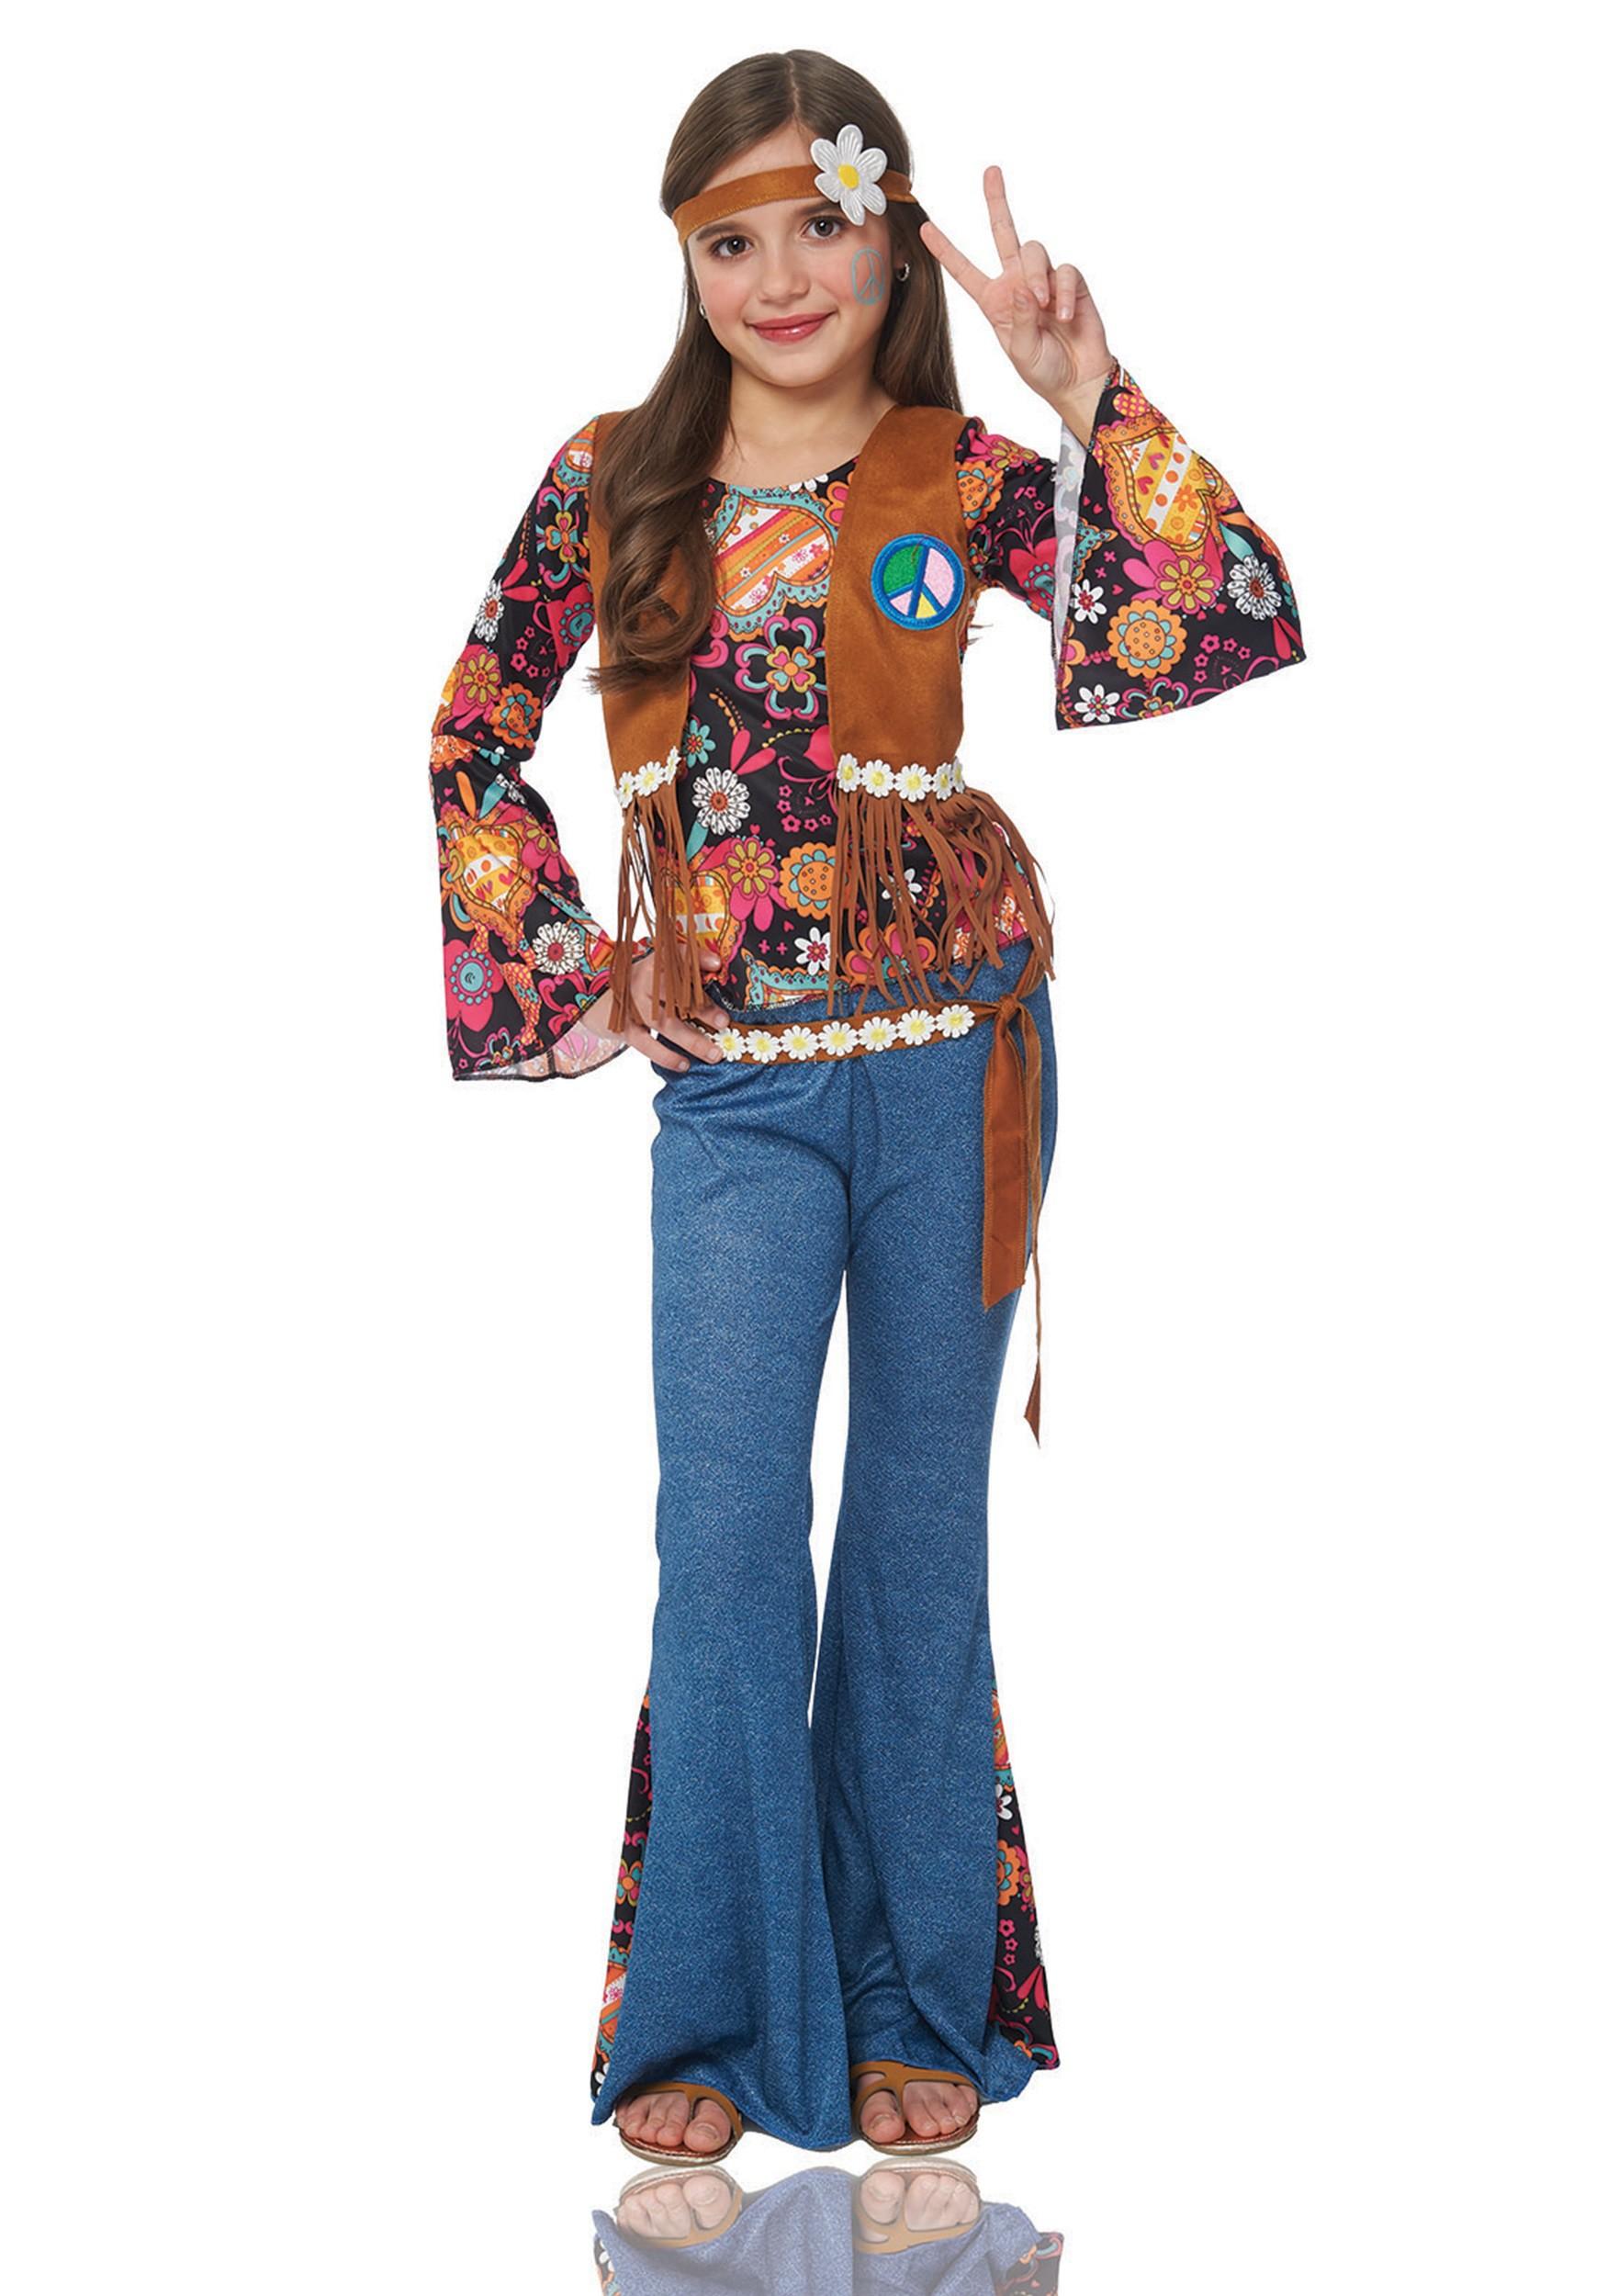 70s costume ideas for teenage girls